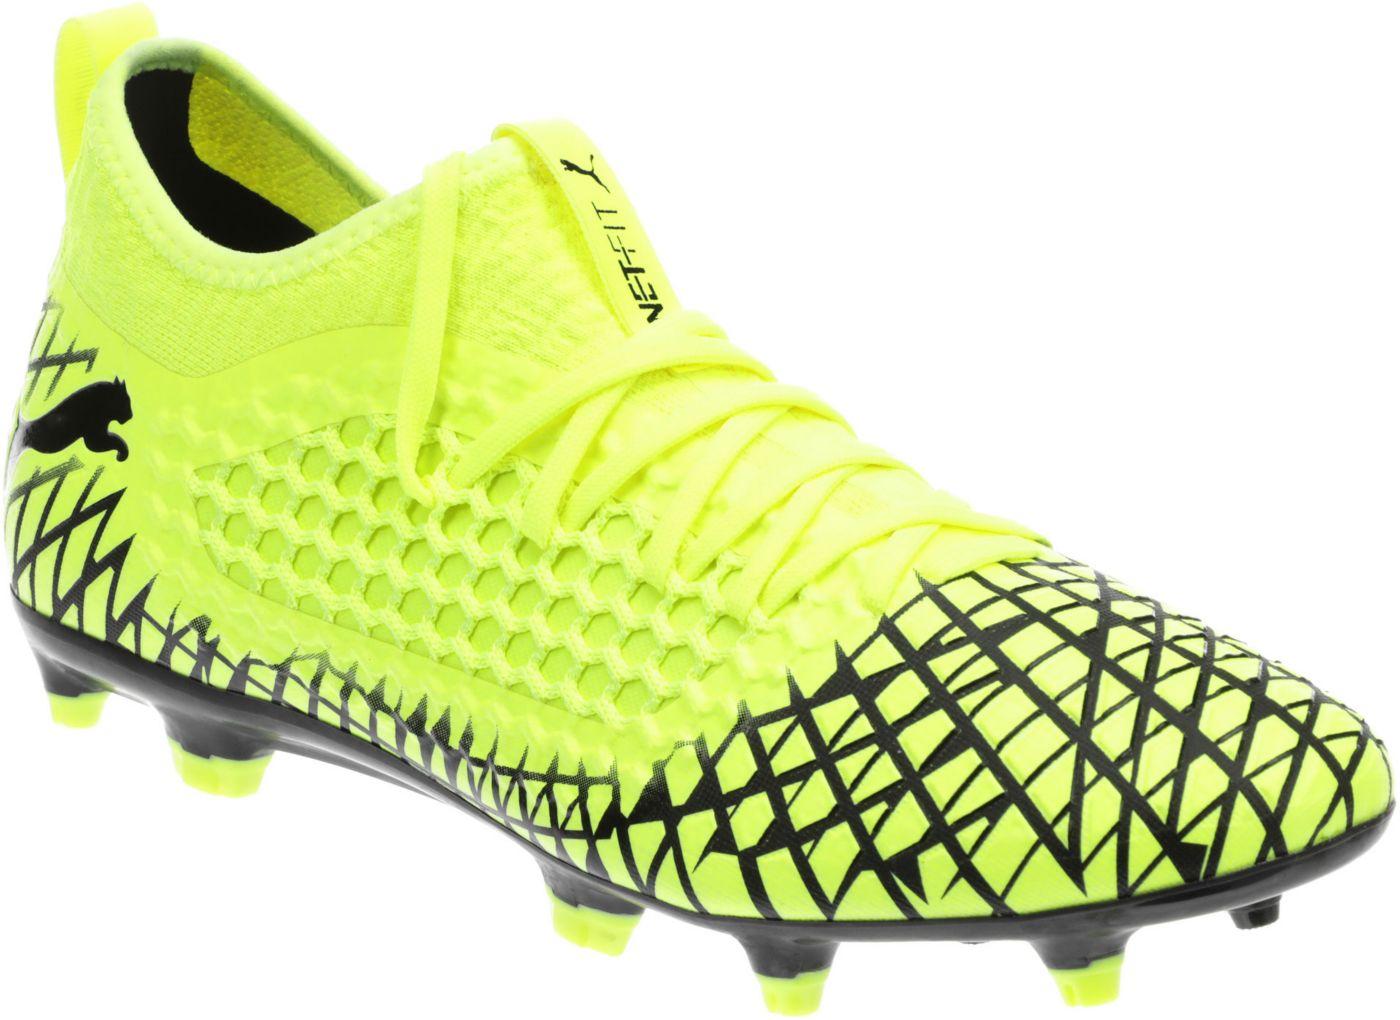 PUMA Men's Future 4.3 Netfit FG/AG Soccer Cleats